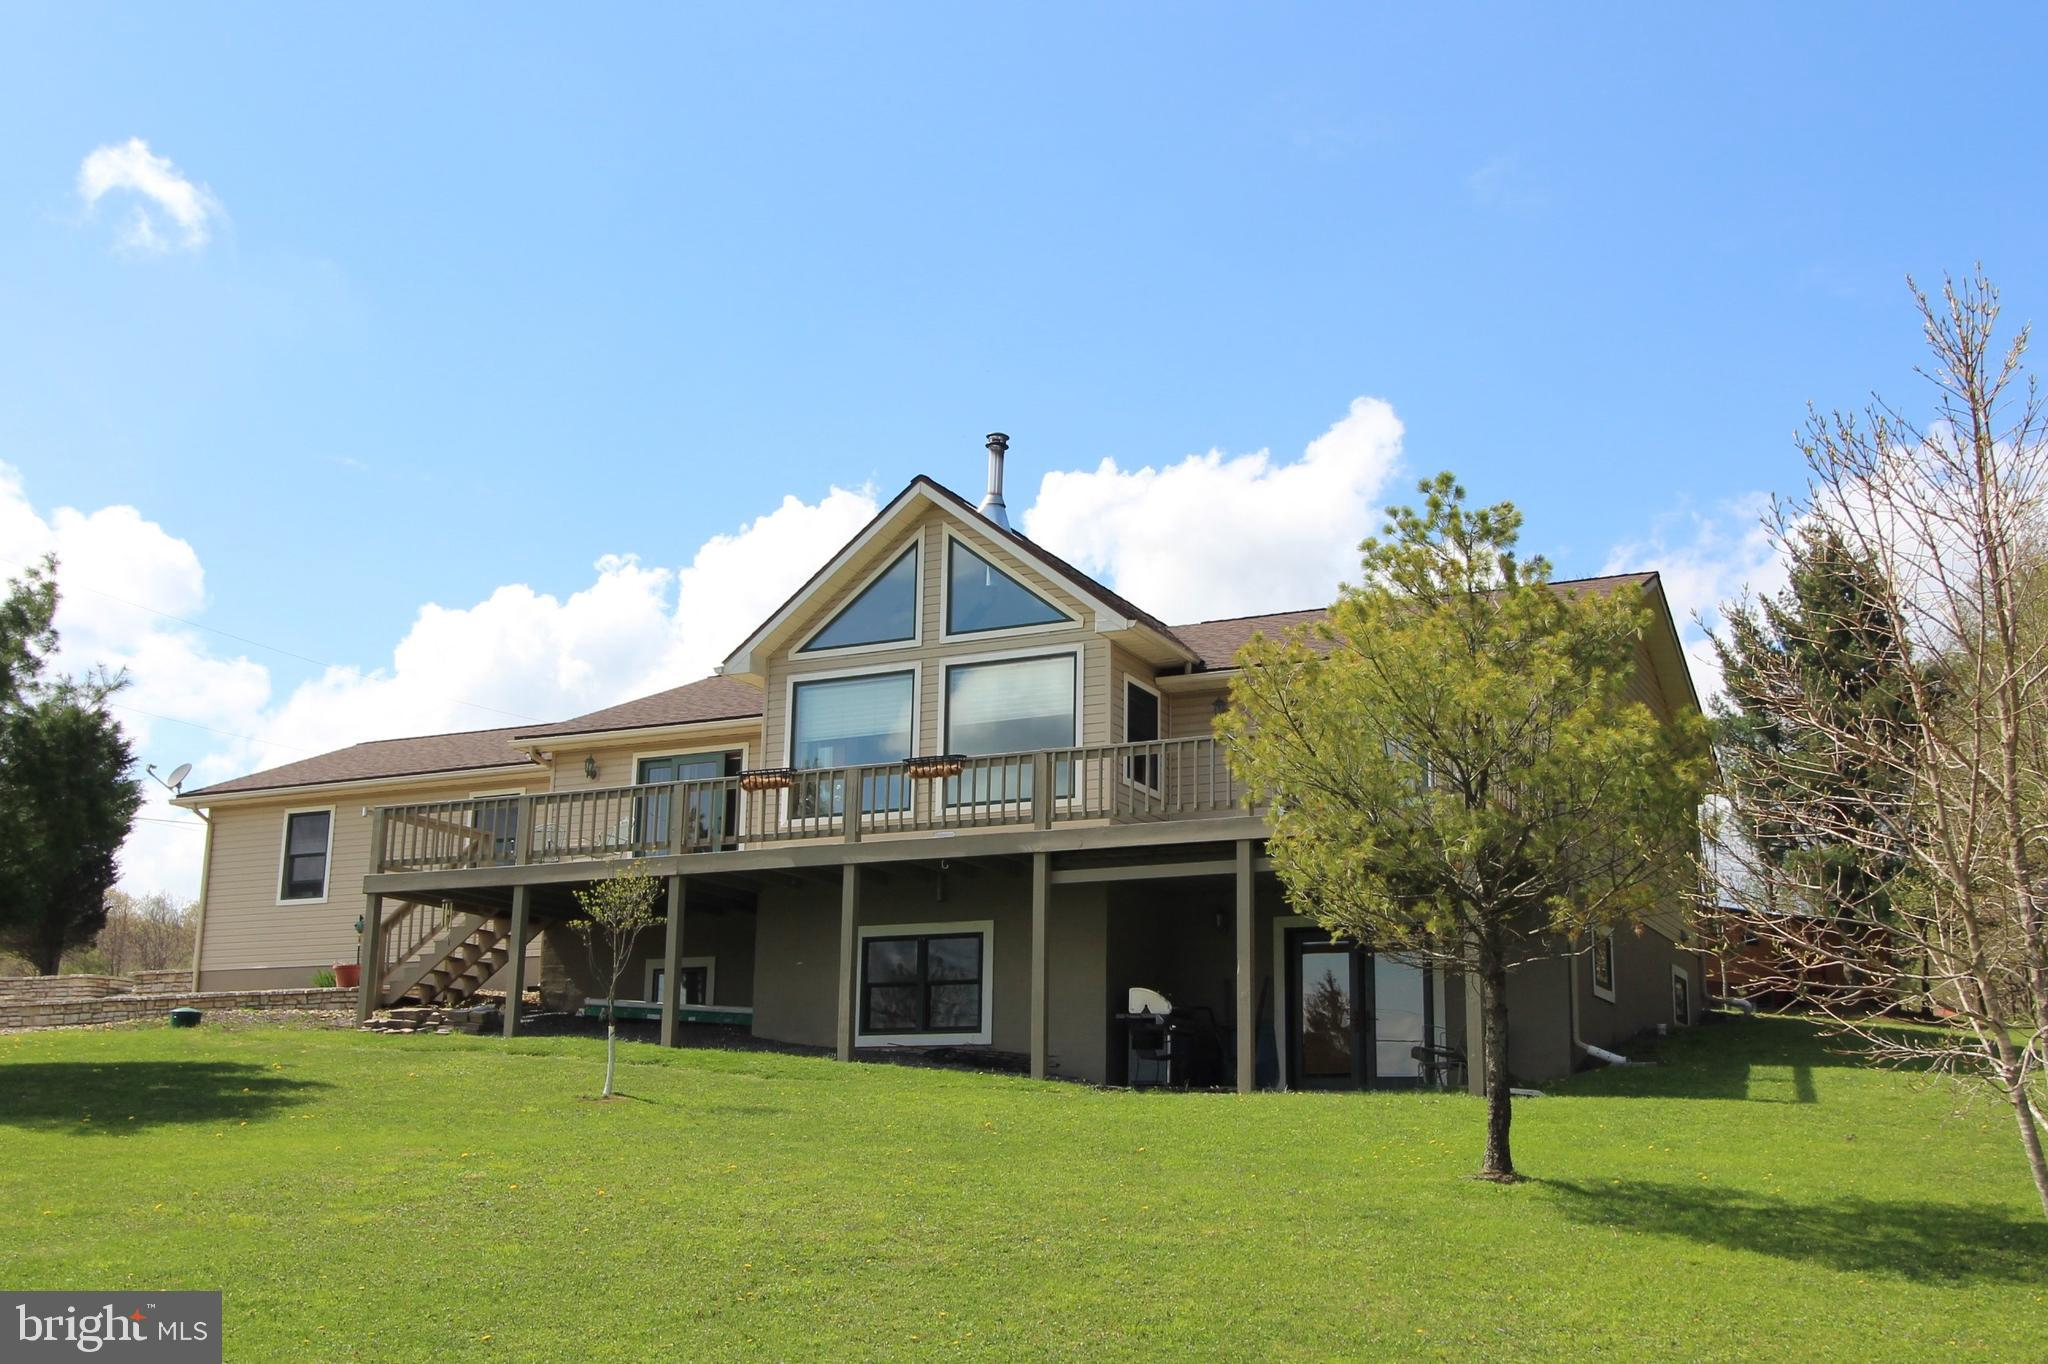 16 CARDINAL LANE, TERRA ALTA, WV 26764